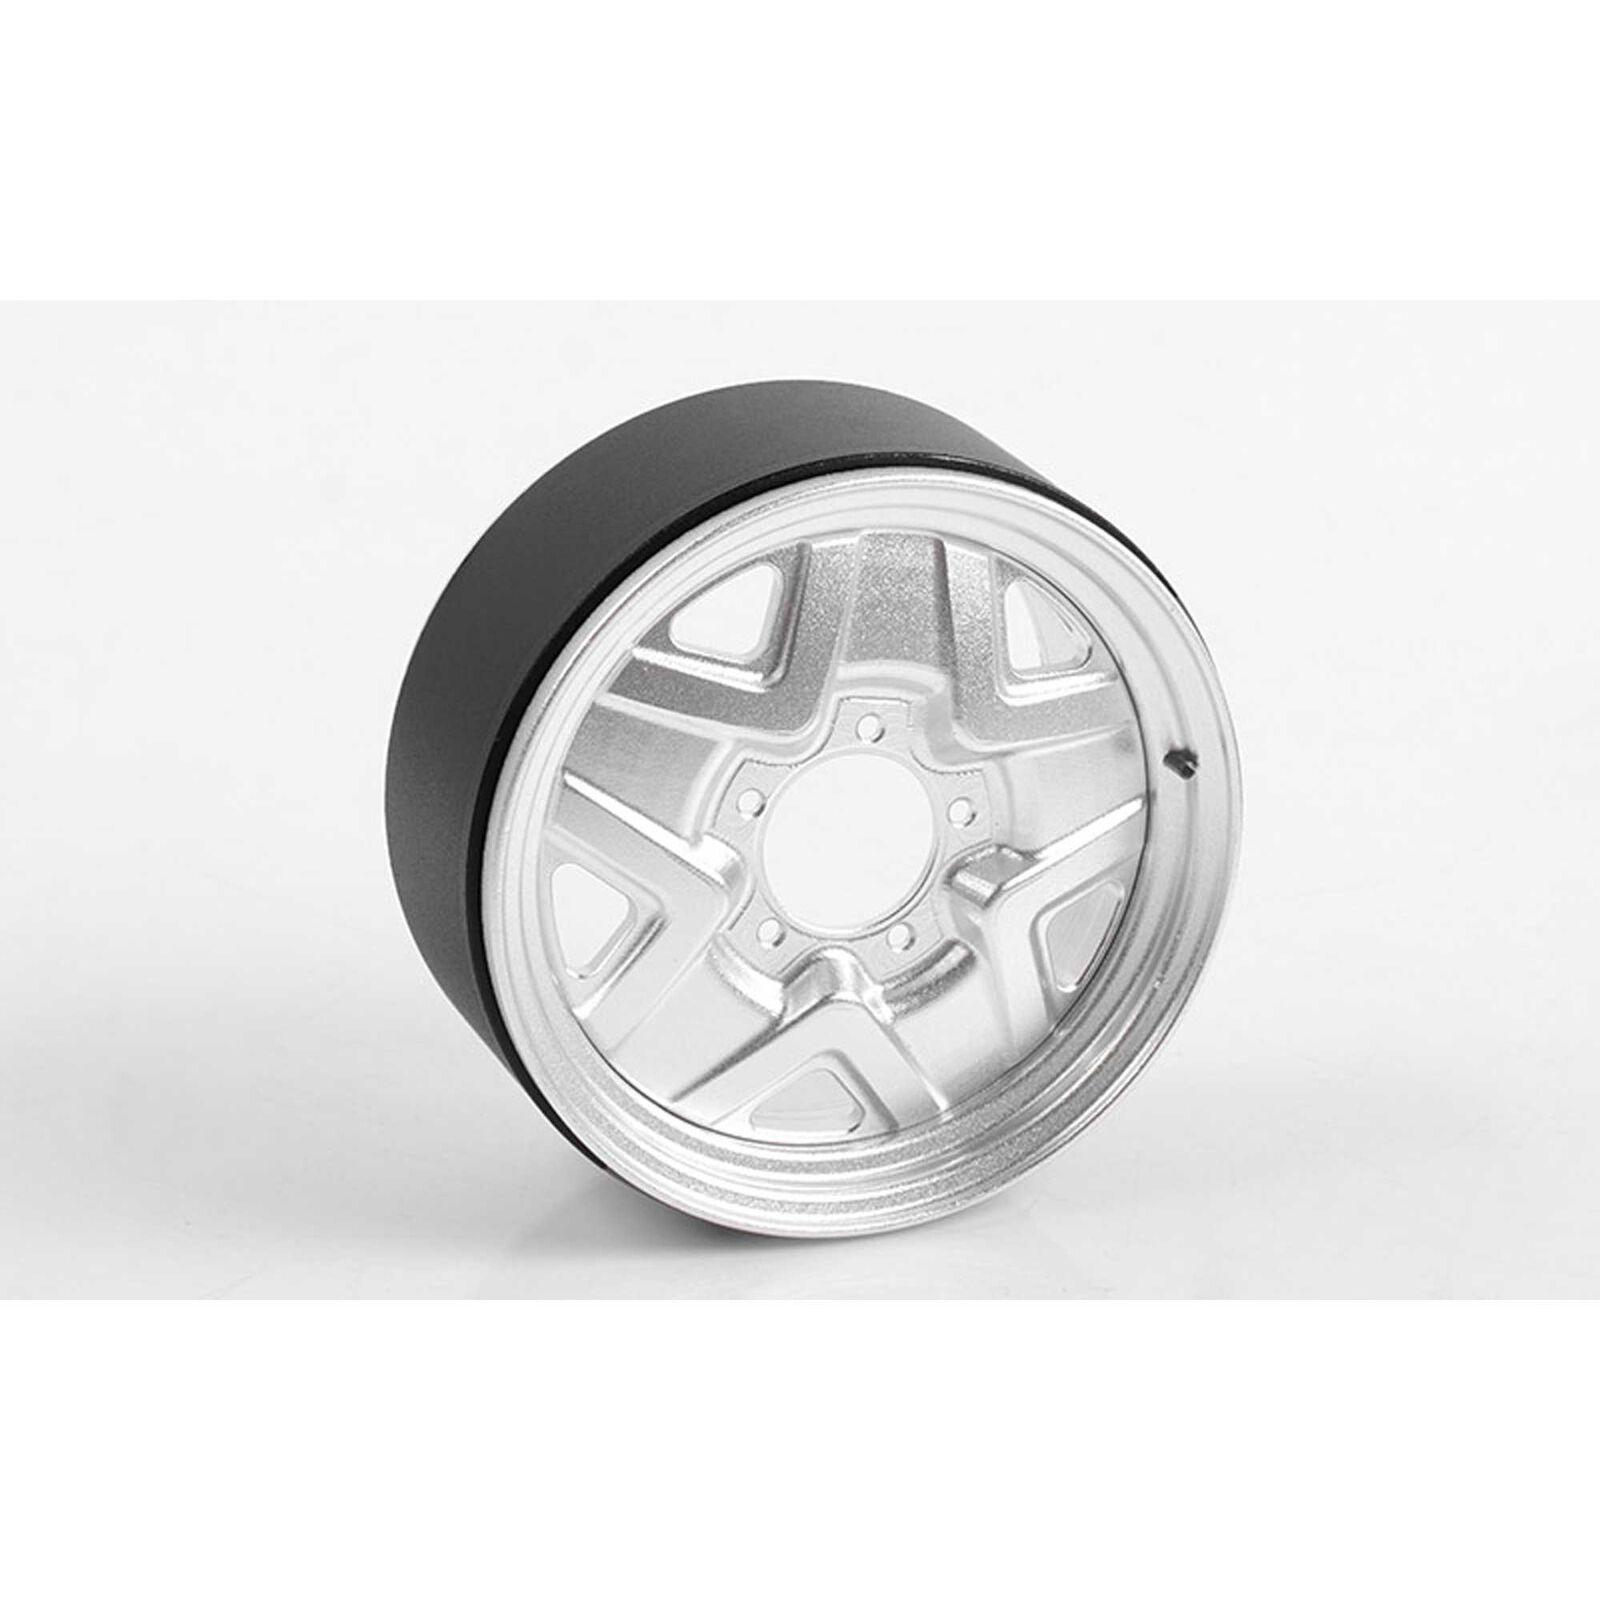 "Waki 2.8"" Wheel: CRS 1/6 Crawler"